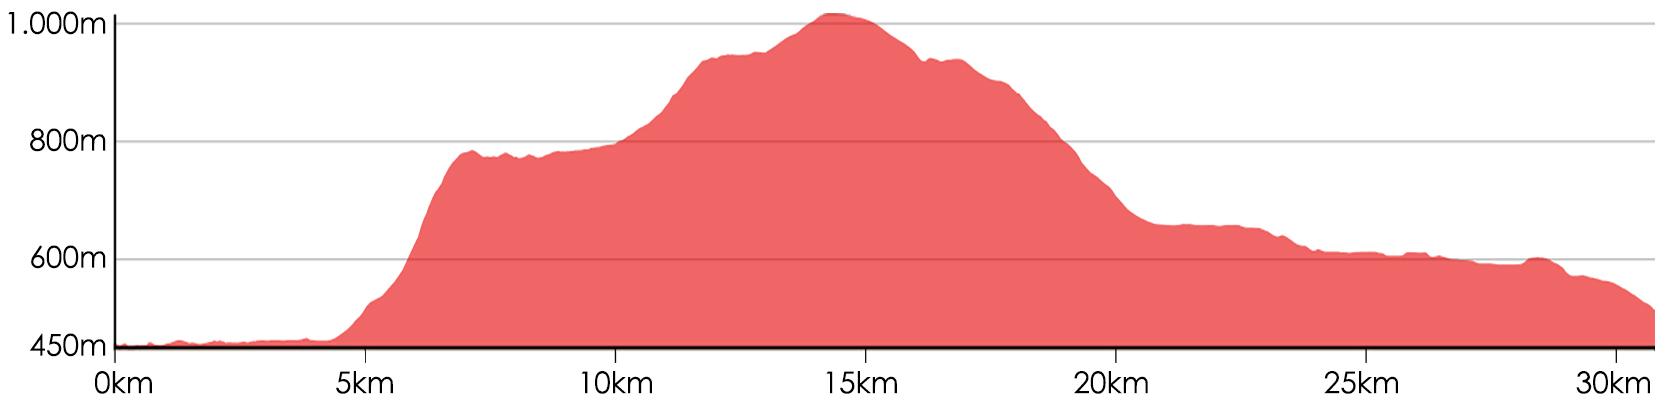 Hoogteprofiel Trail 2